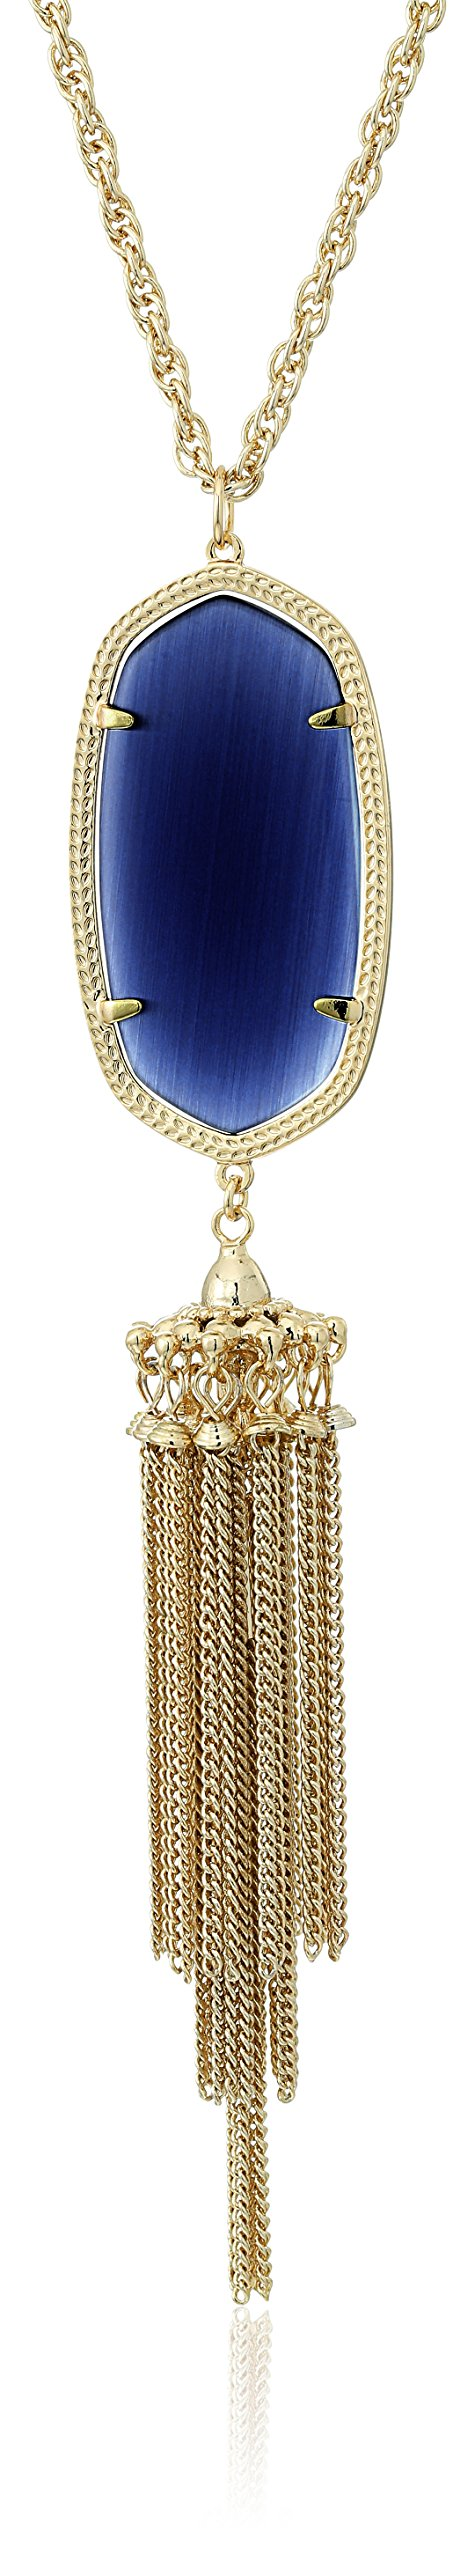 Kendra Scott ''Signature'' Rayne Gold plated Navy Glass Pendant Necklace,  30'' + 2'' Extender